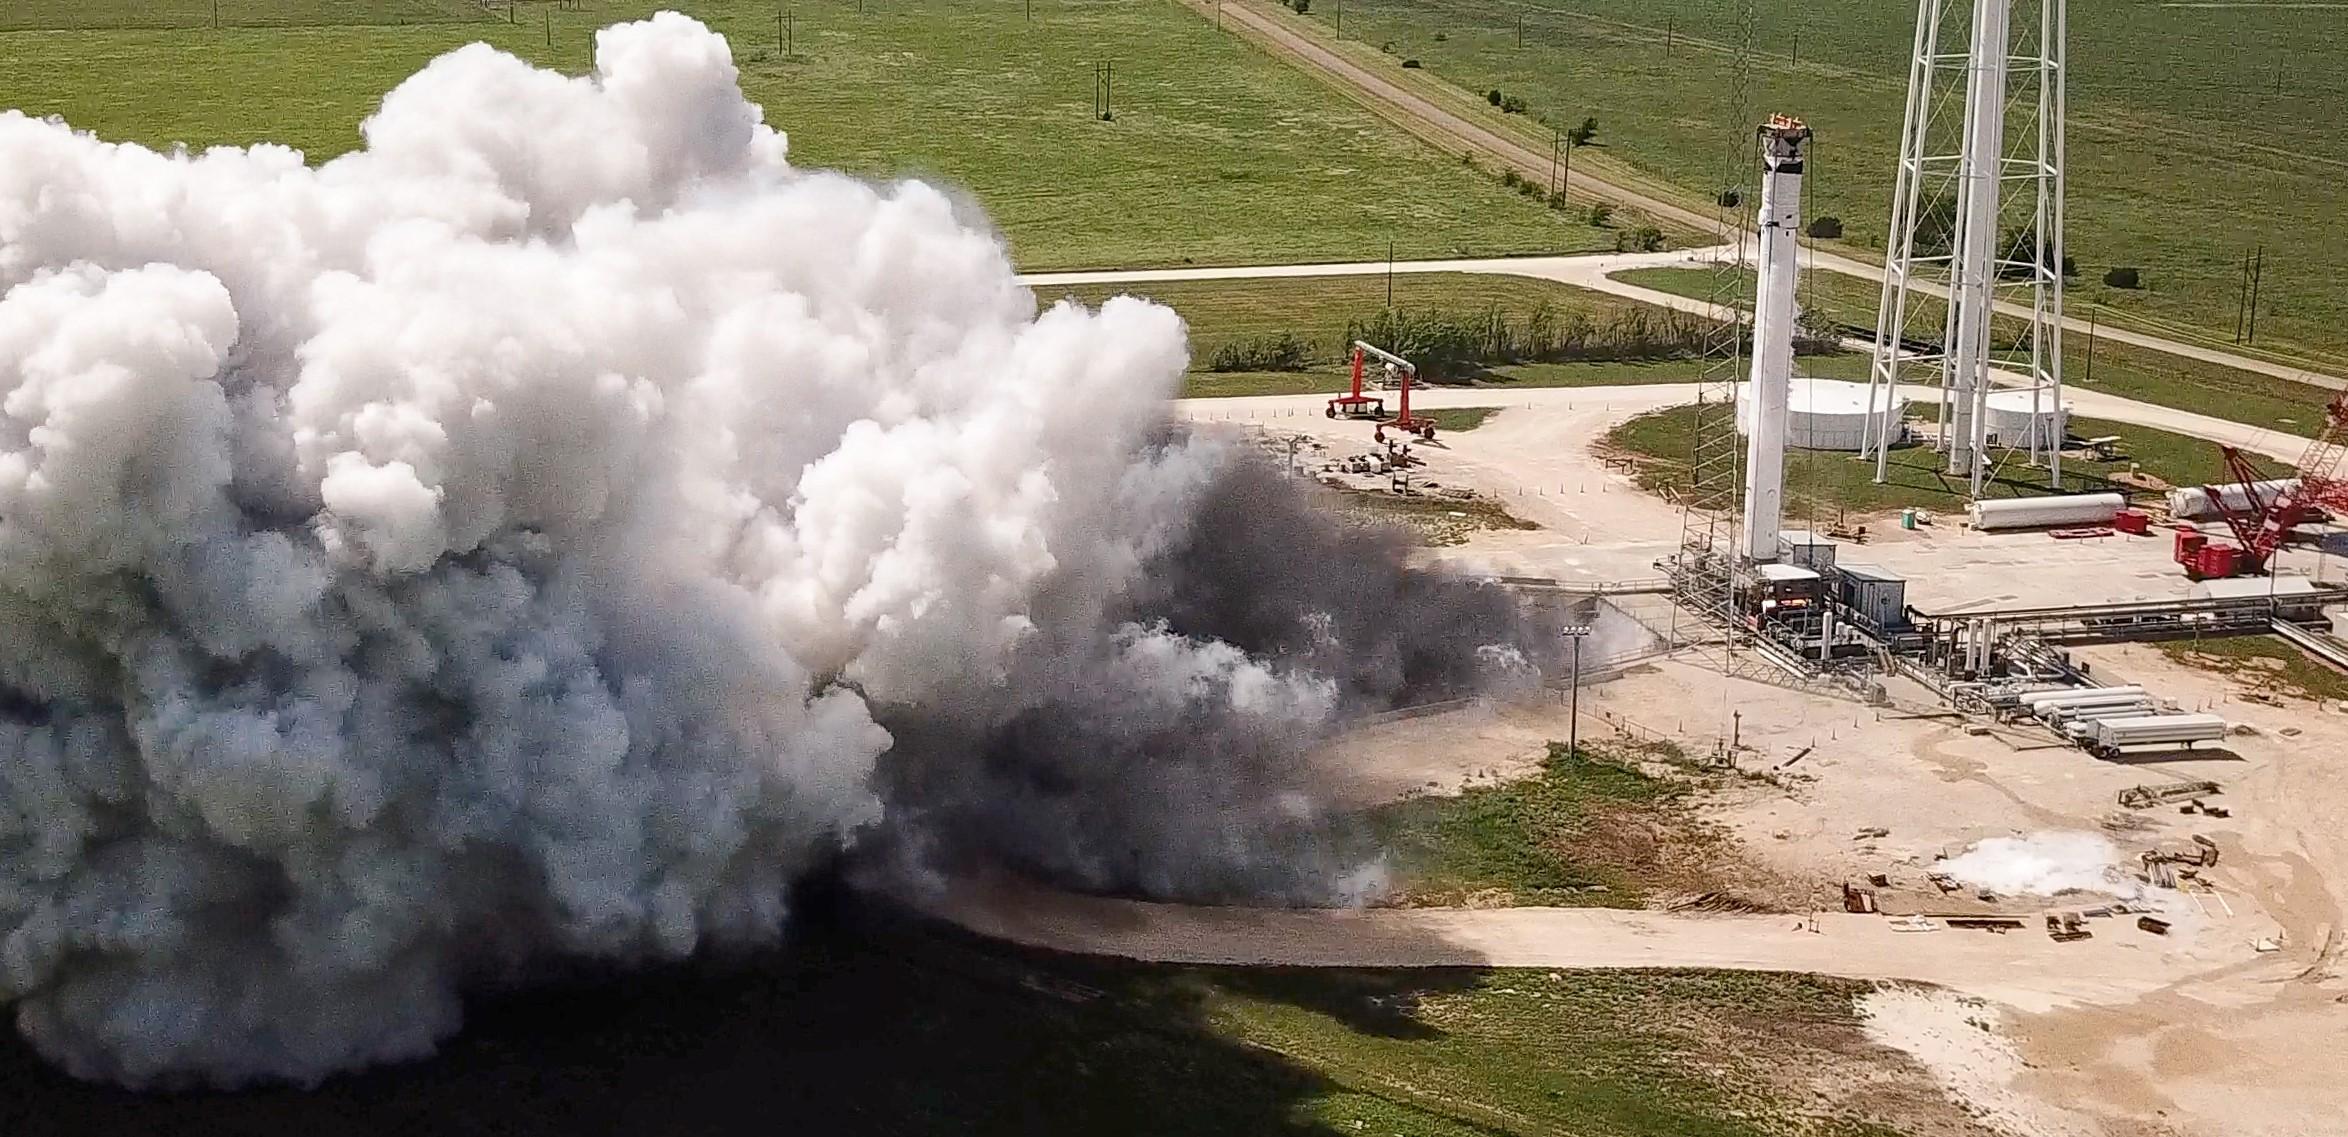 Crew-1 Falcon 9 B1061 static fire April 2020 (SpaceX) 1 crop 2